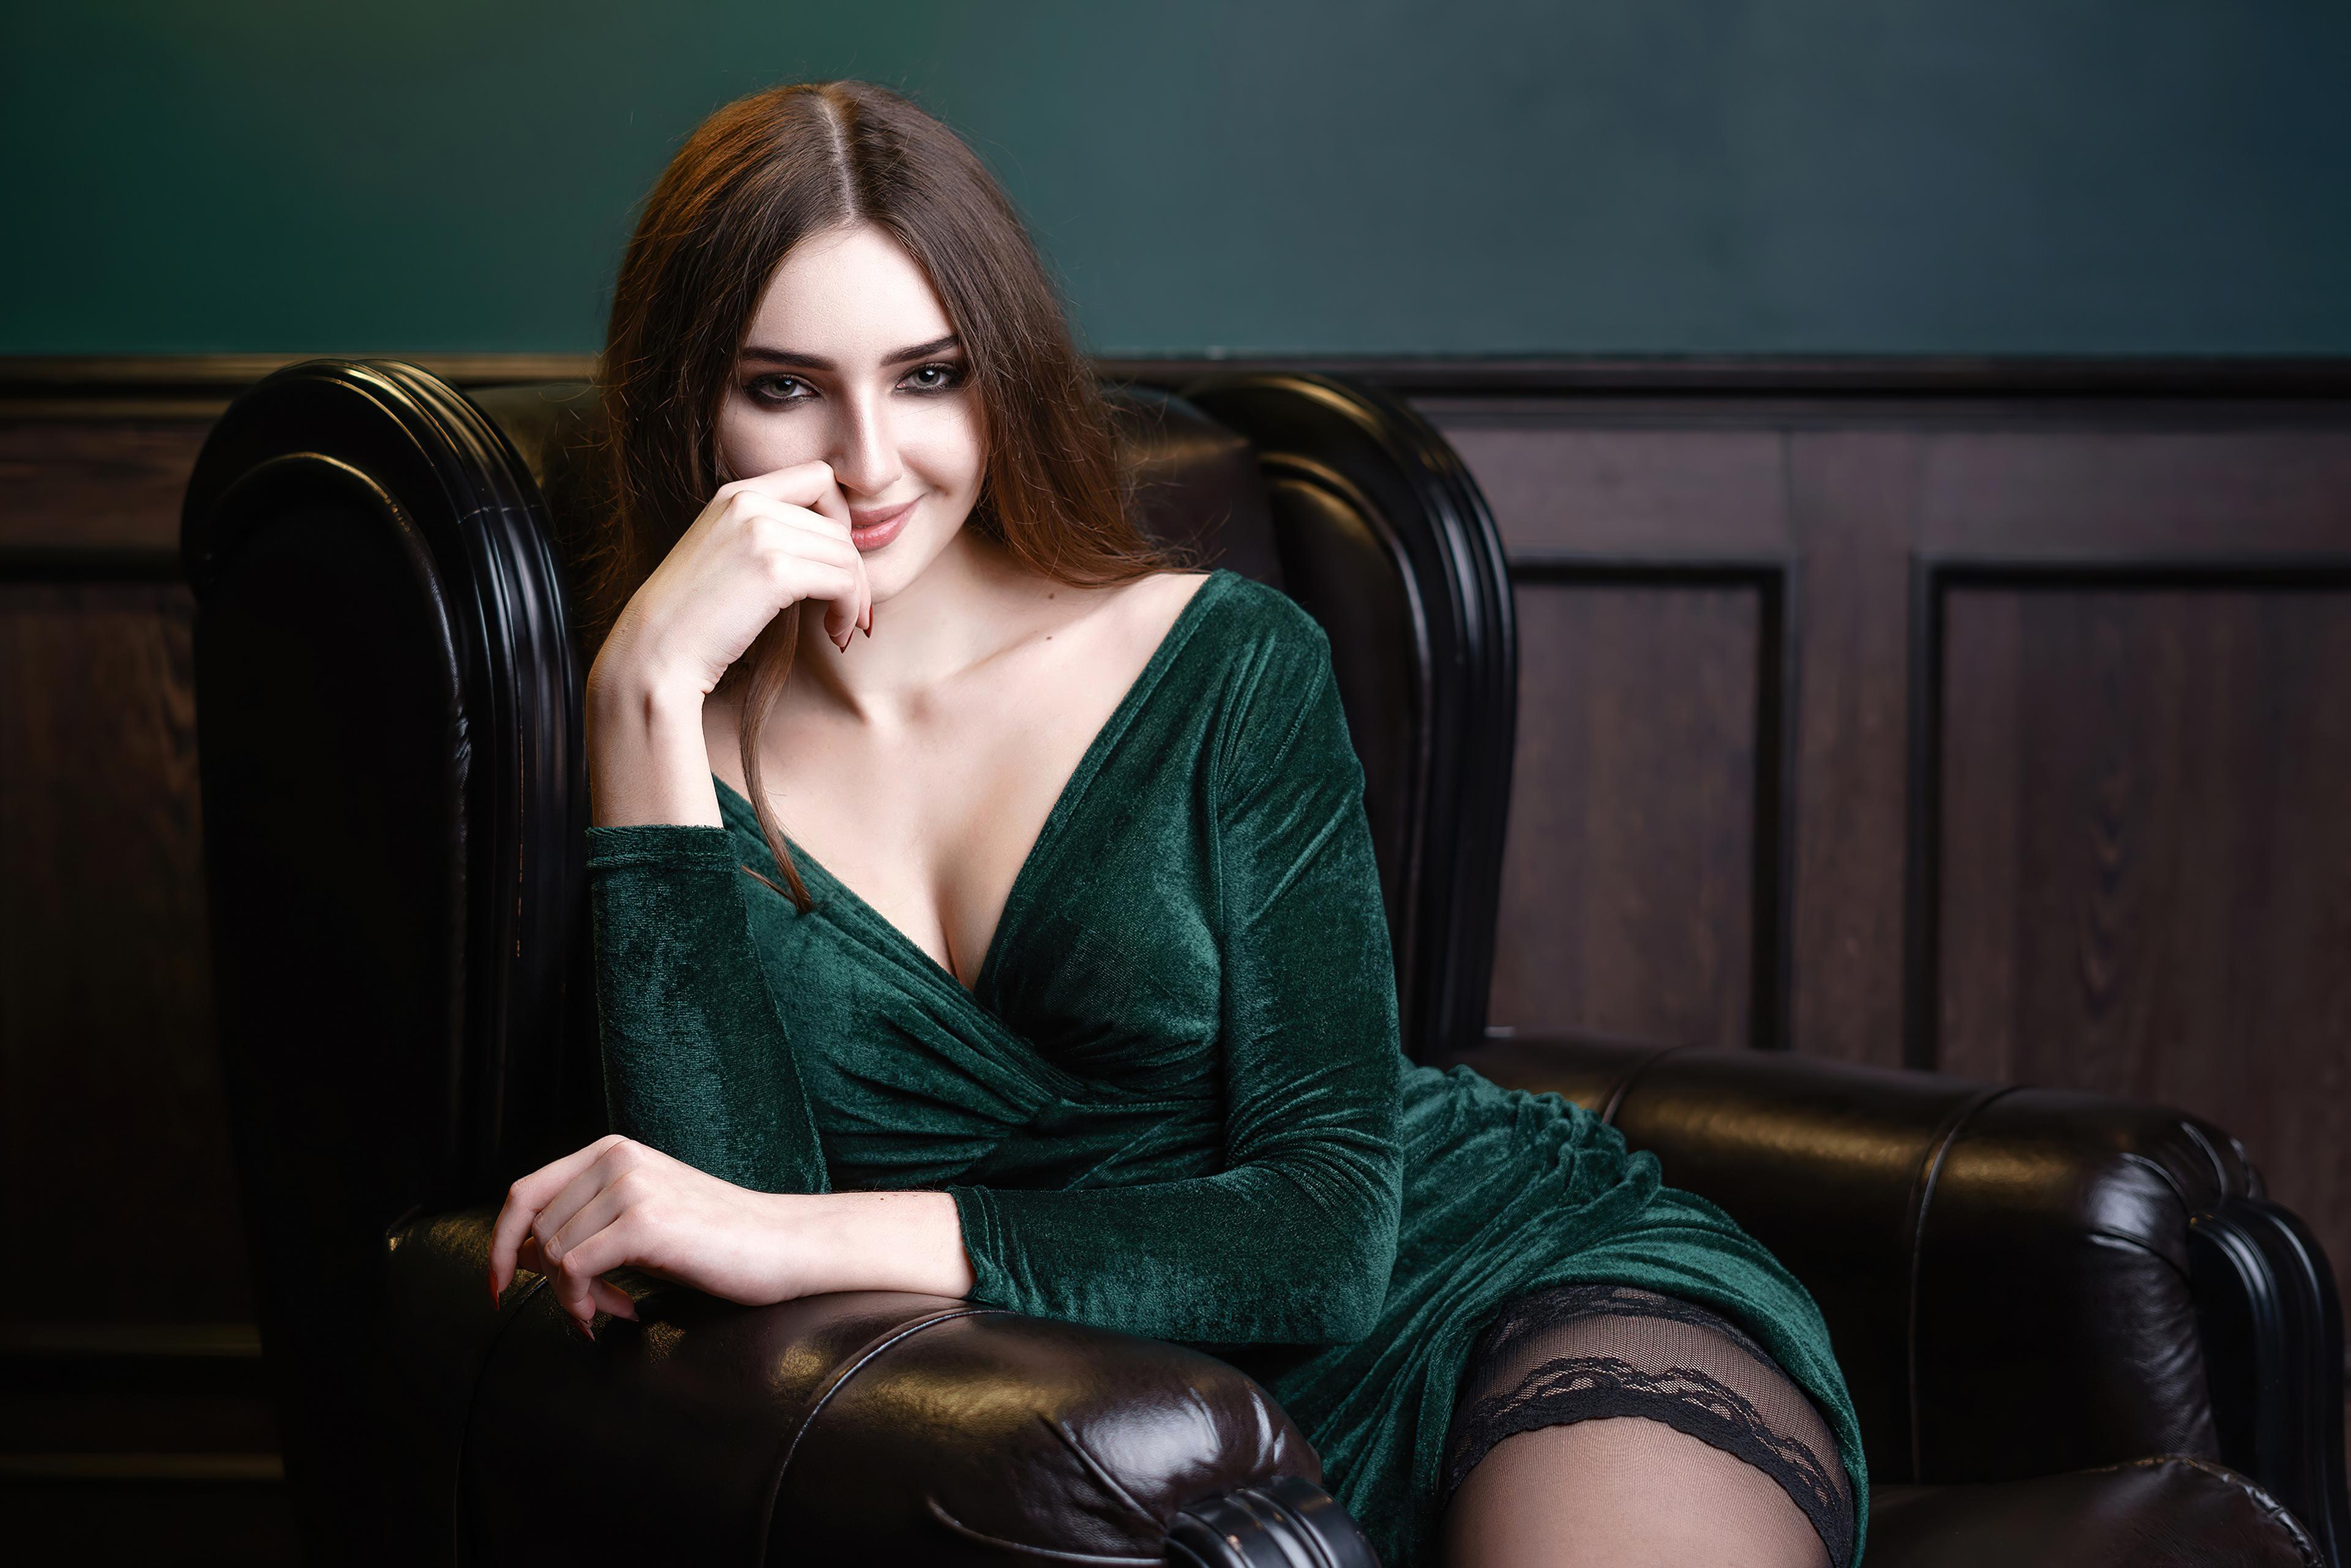 girl sitting arm on chair smiling 4k 1596916310 - Girl Sitting Arm On Chair Smiling 4k -